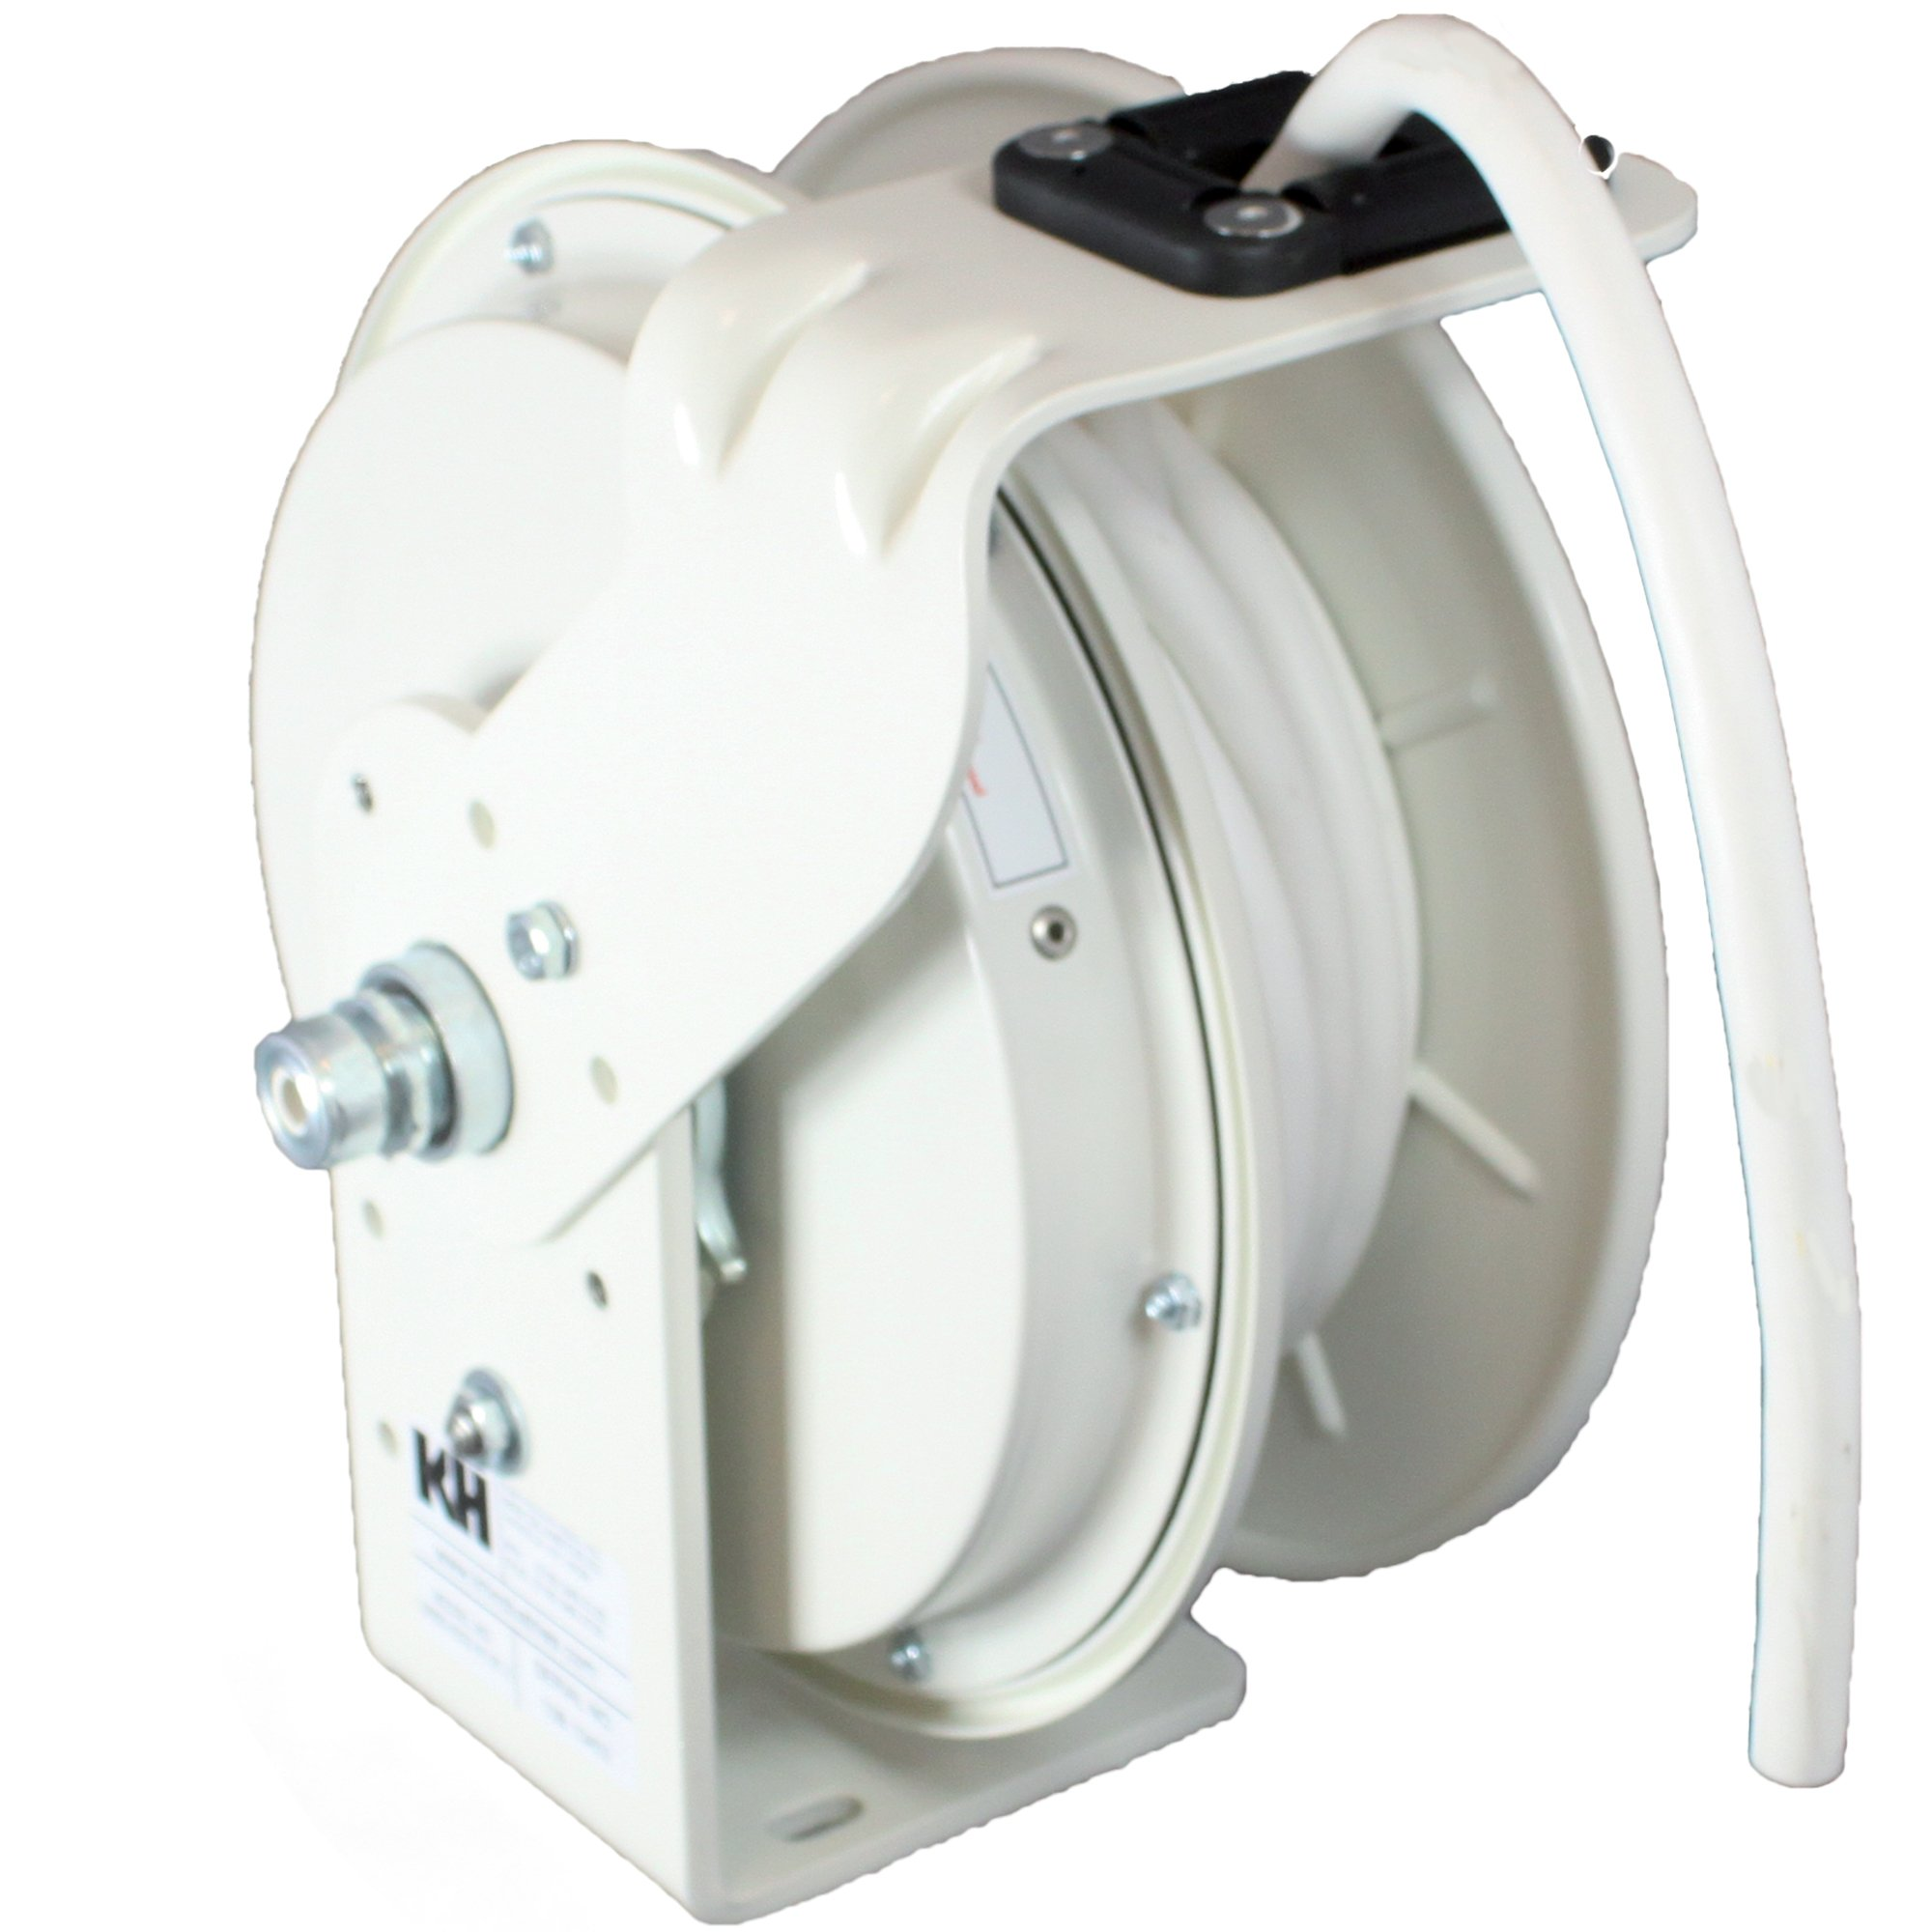 KH Industries RTB Series ReelTuff Power Cord Reel, 12/3 SJOW White Cable, 20 Amp, 50' Length, White Powder Coat Finish